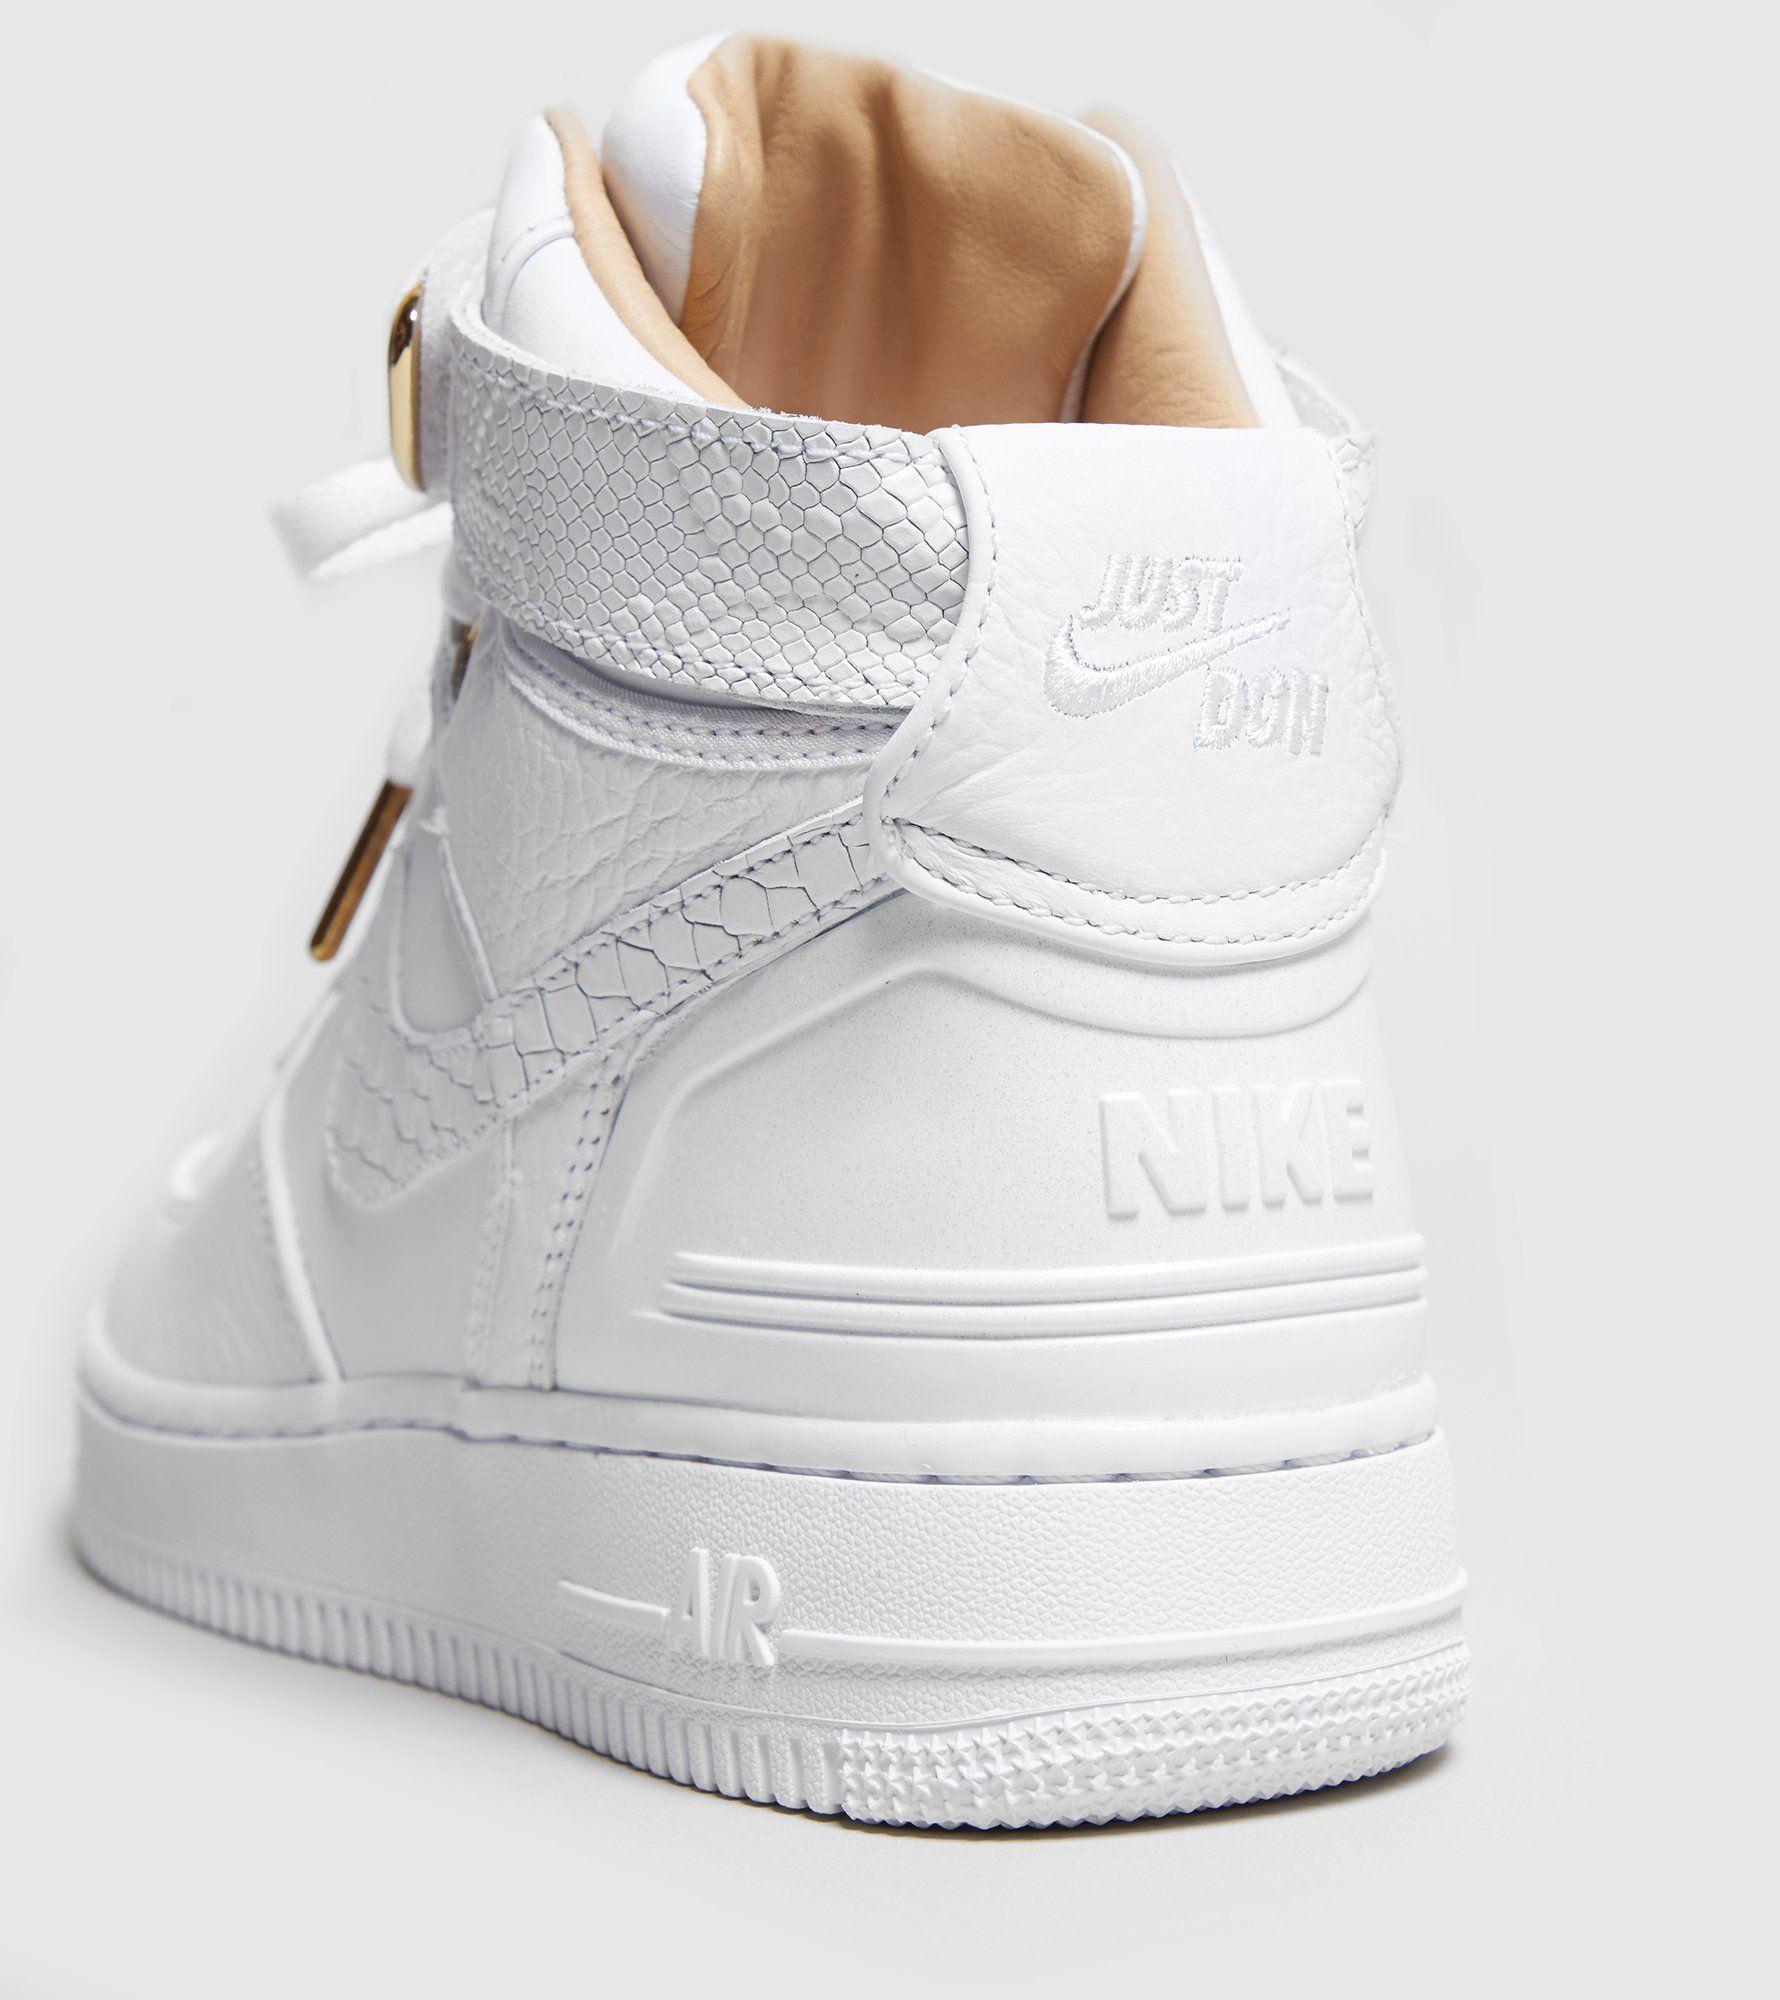 Nike Air Force 1 Hi Just Don Women's